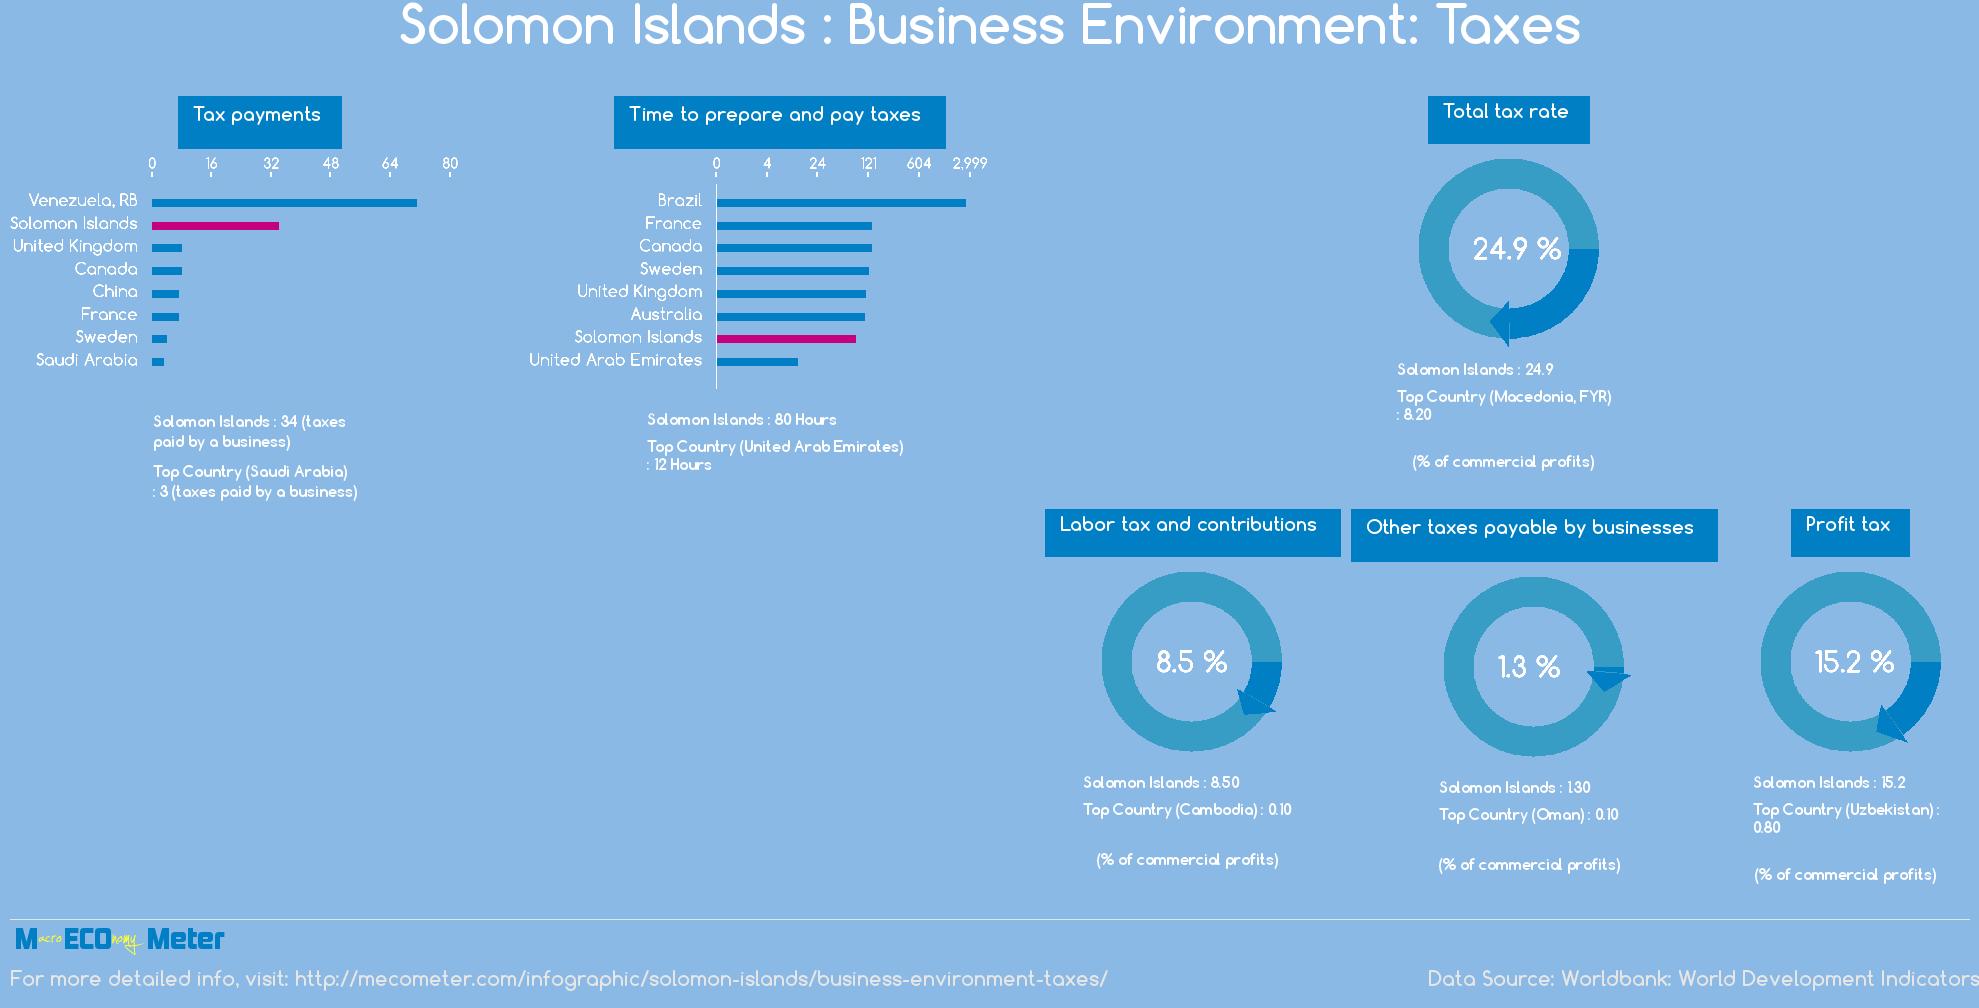 Solomon Islands : Business Environment: Taxes